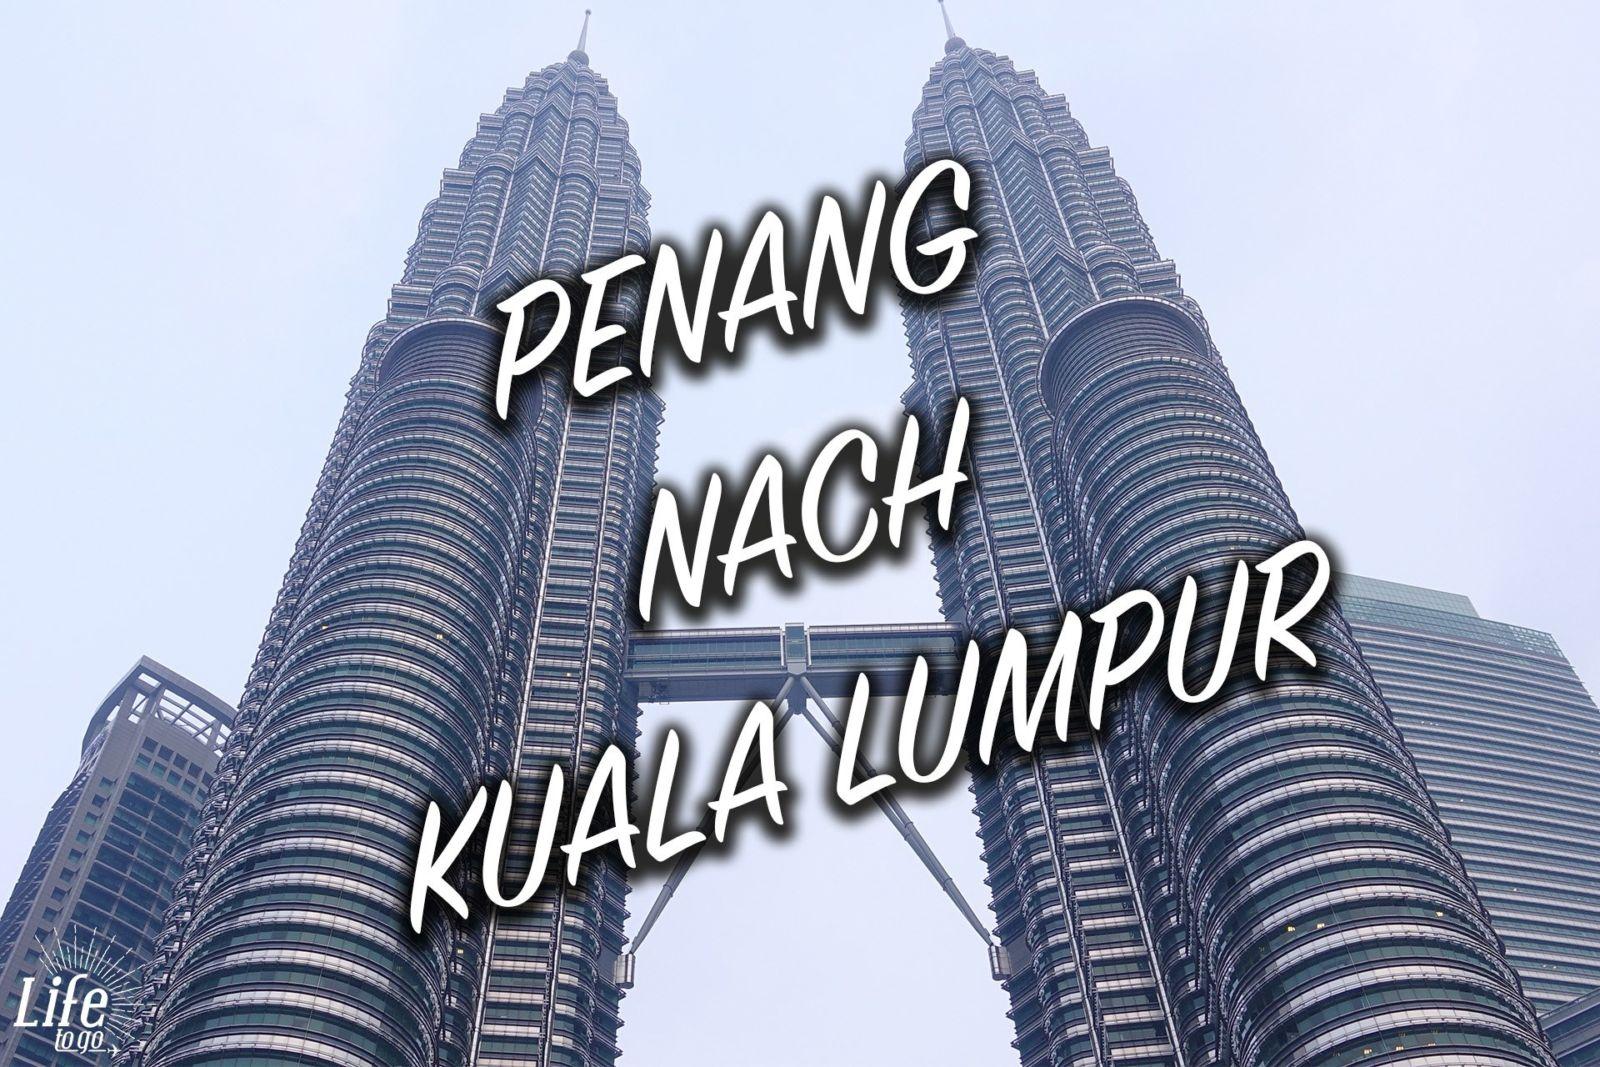 Penang nach Kuala Lumpur per Luxusbus - 1